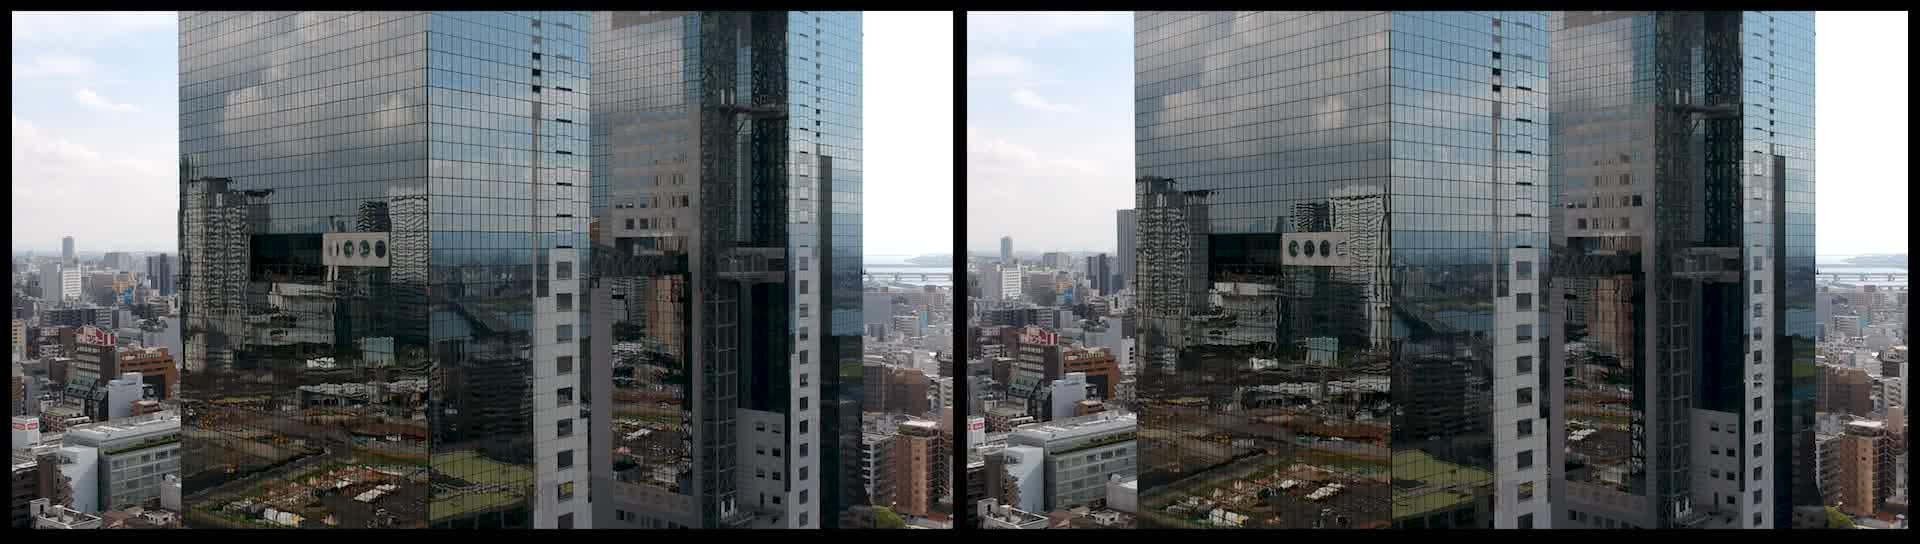 crossview GIFs